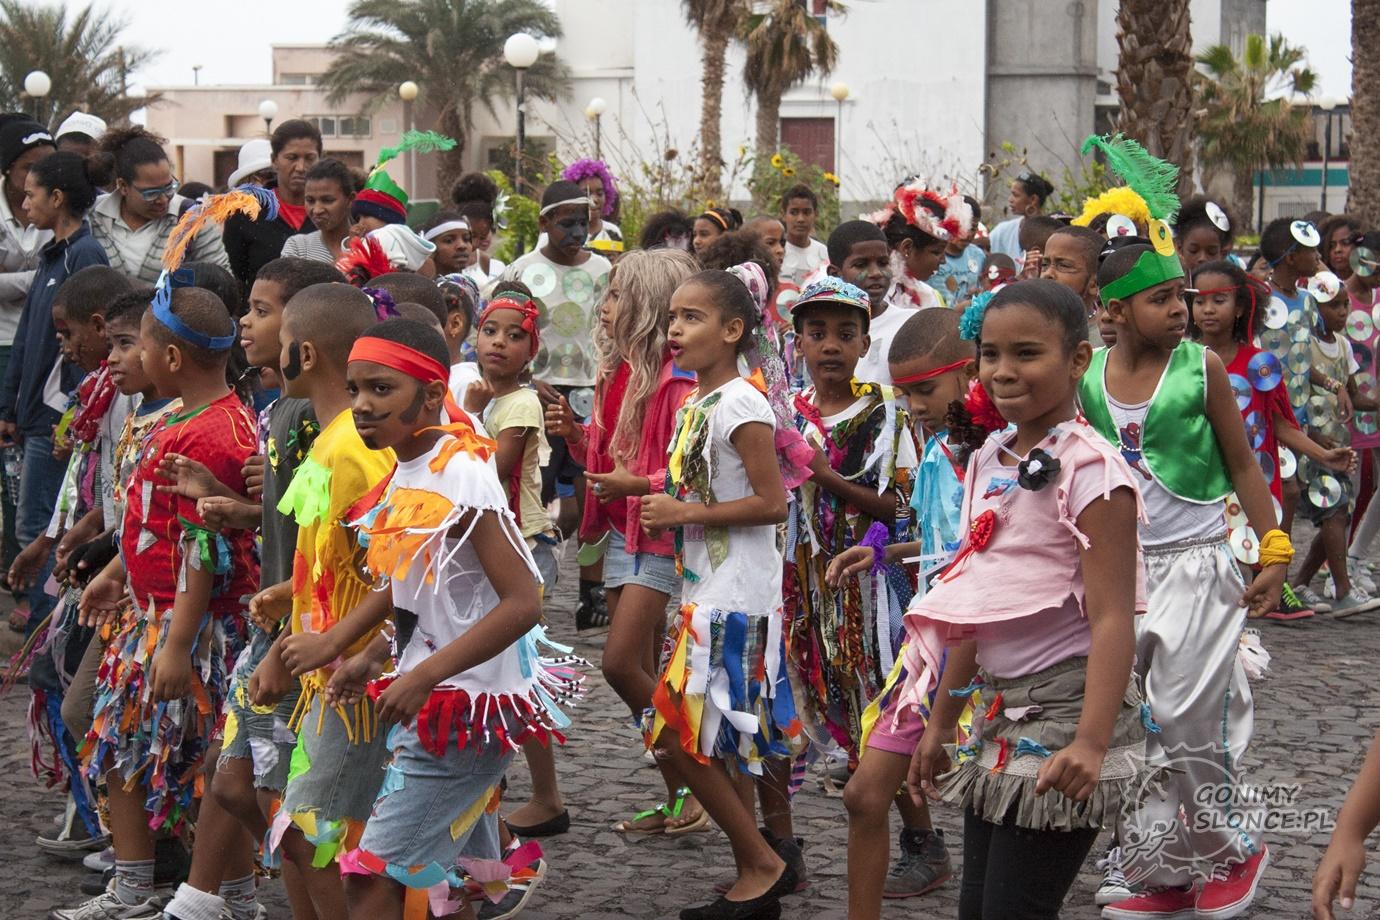 Karnawałowe Santo Antao